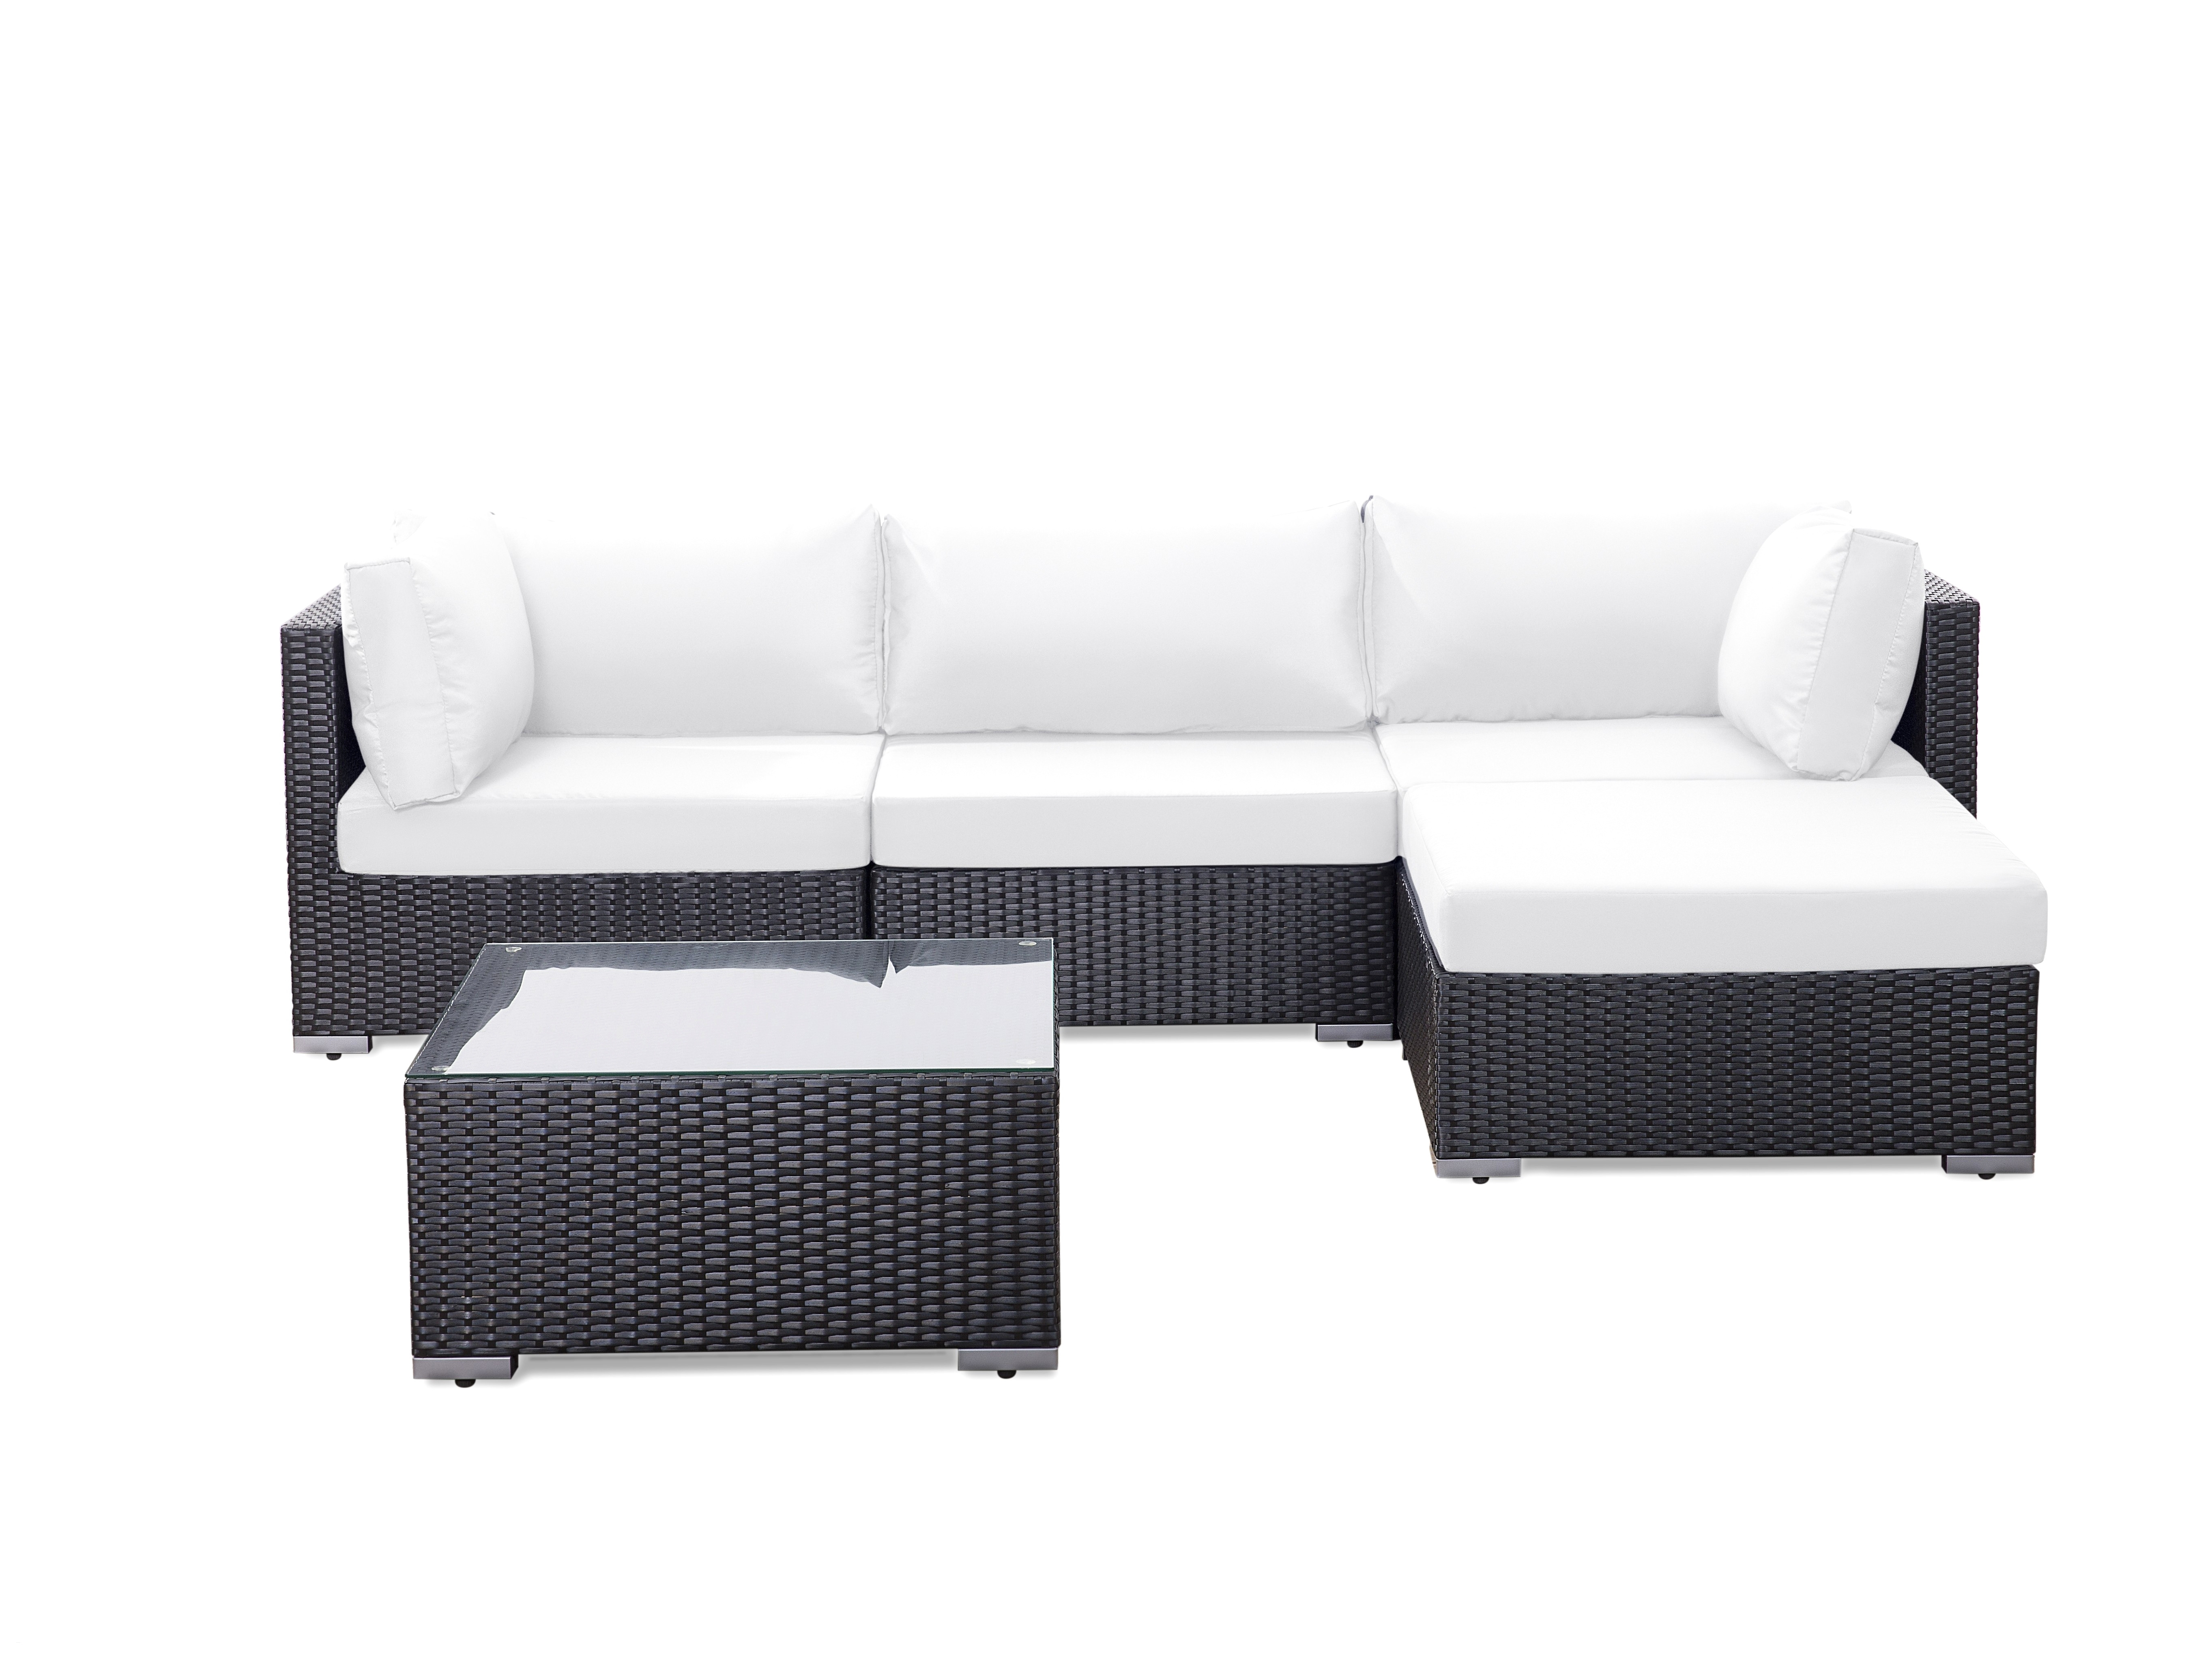 garten kamin frisch wicker patio lounge chairs fresh luxuria¶s wicker outdoor sofa 0d of patio furniture sets under 200